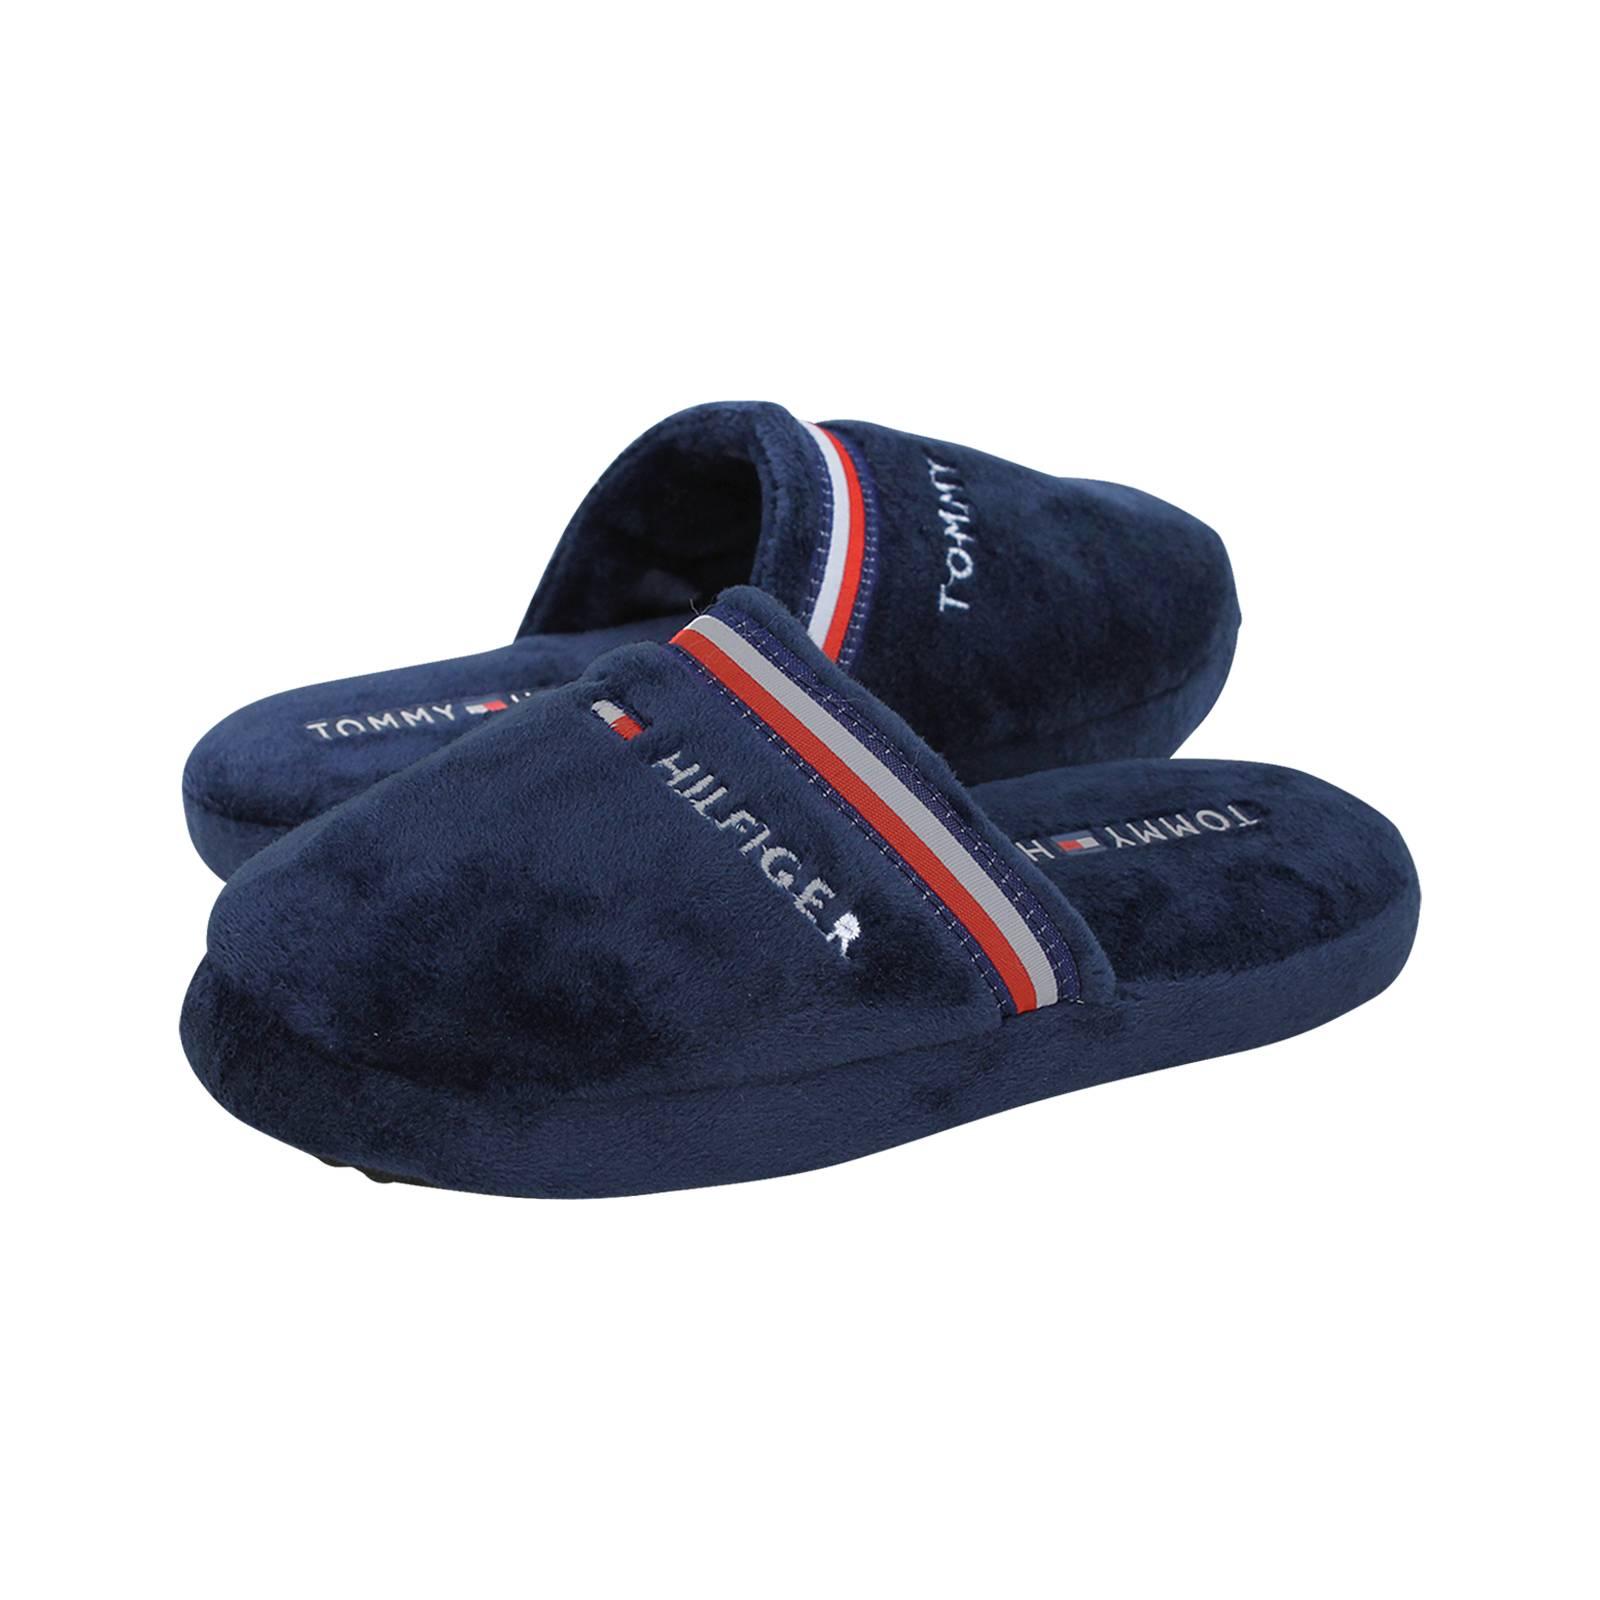 Tommy Hilfiger Kids' slippers